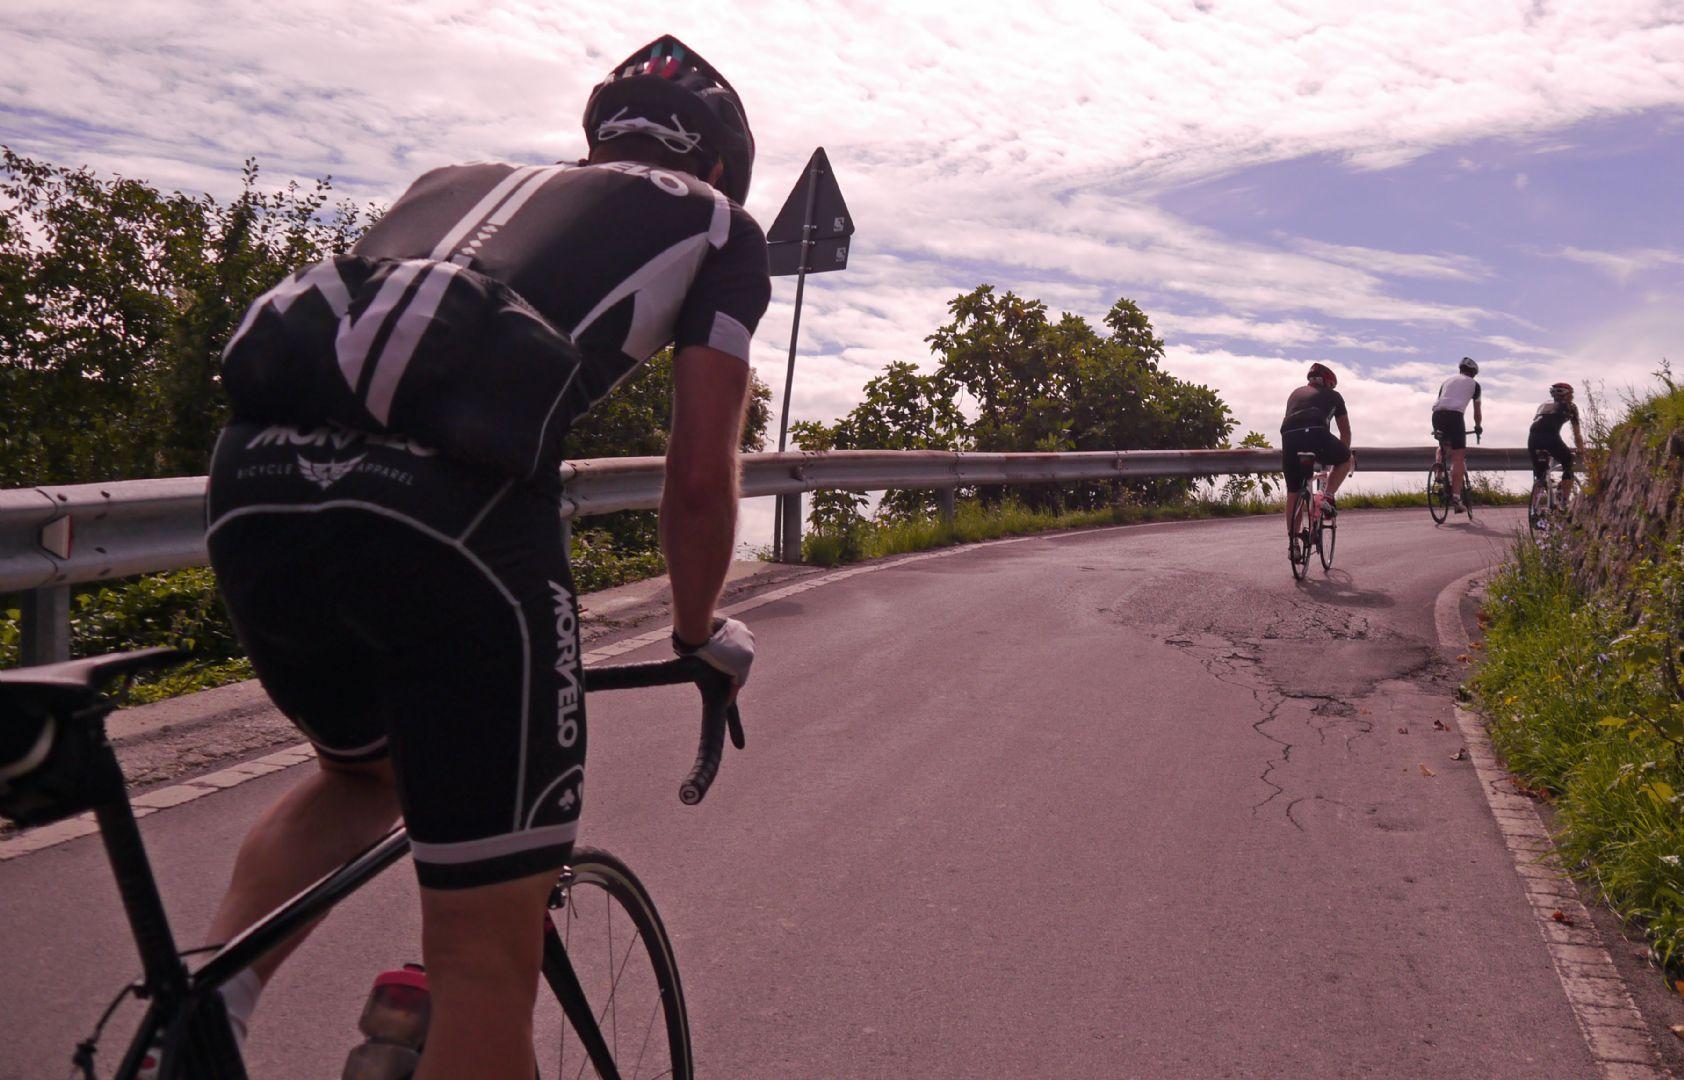 Chasing down the pack.jpg - Italy - Garfagnana - The Mountains of Tuscany - Italia Road Cycling